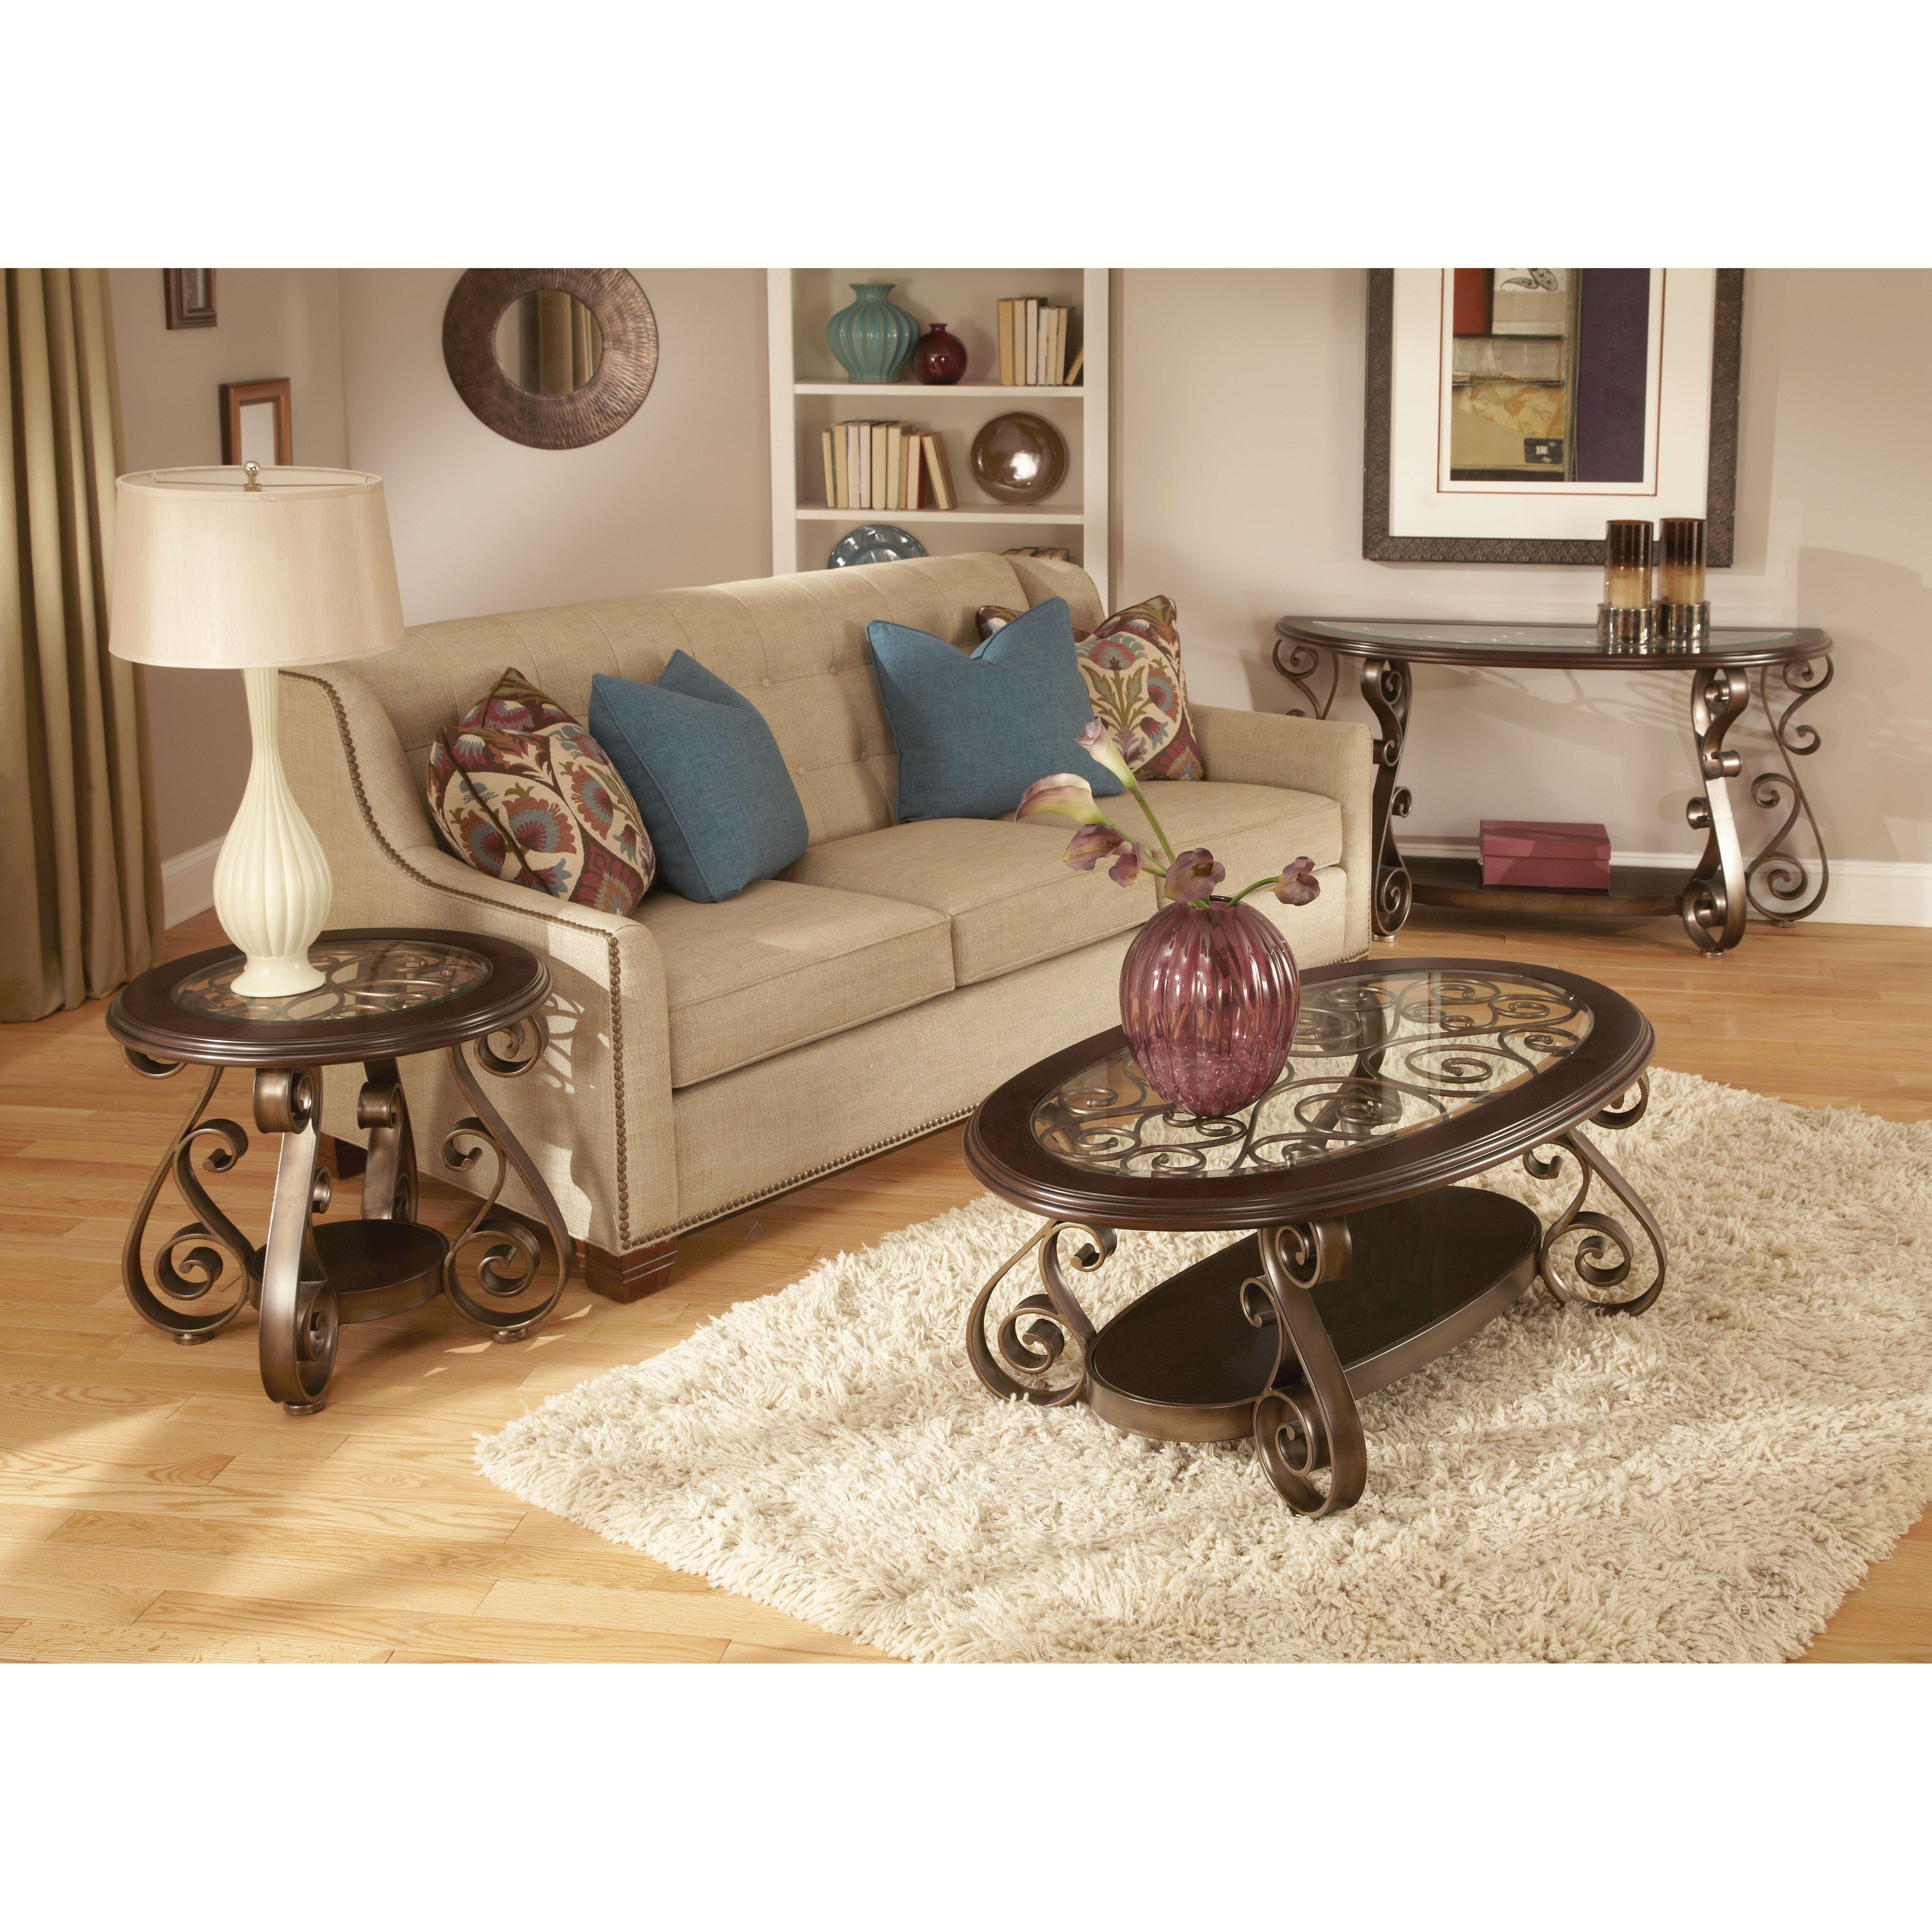 Standard Furniture Bombay Coffee Table Reviews Wayfair